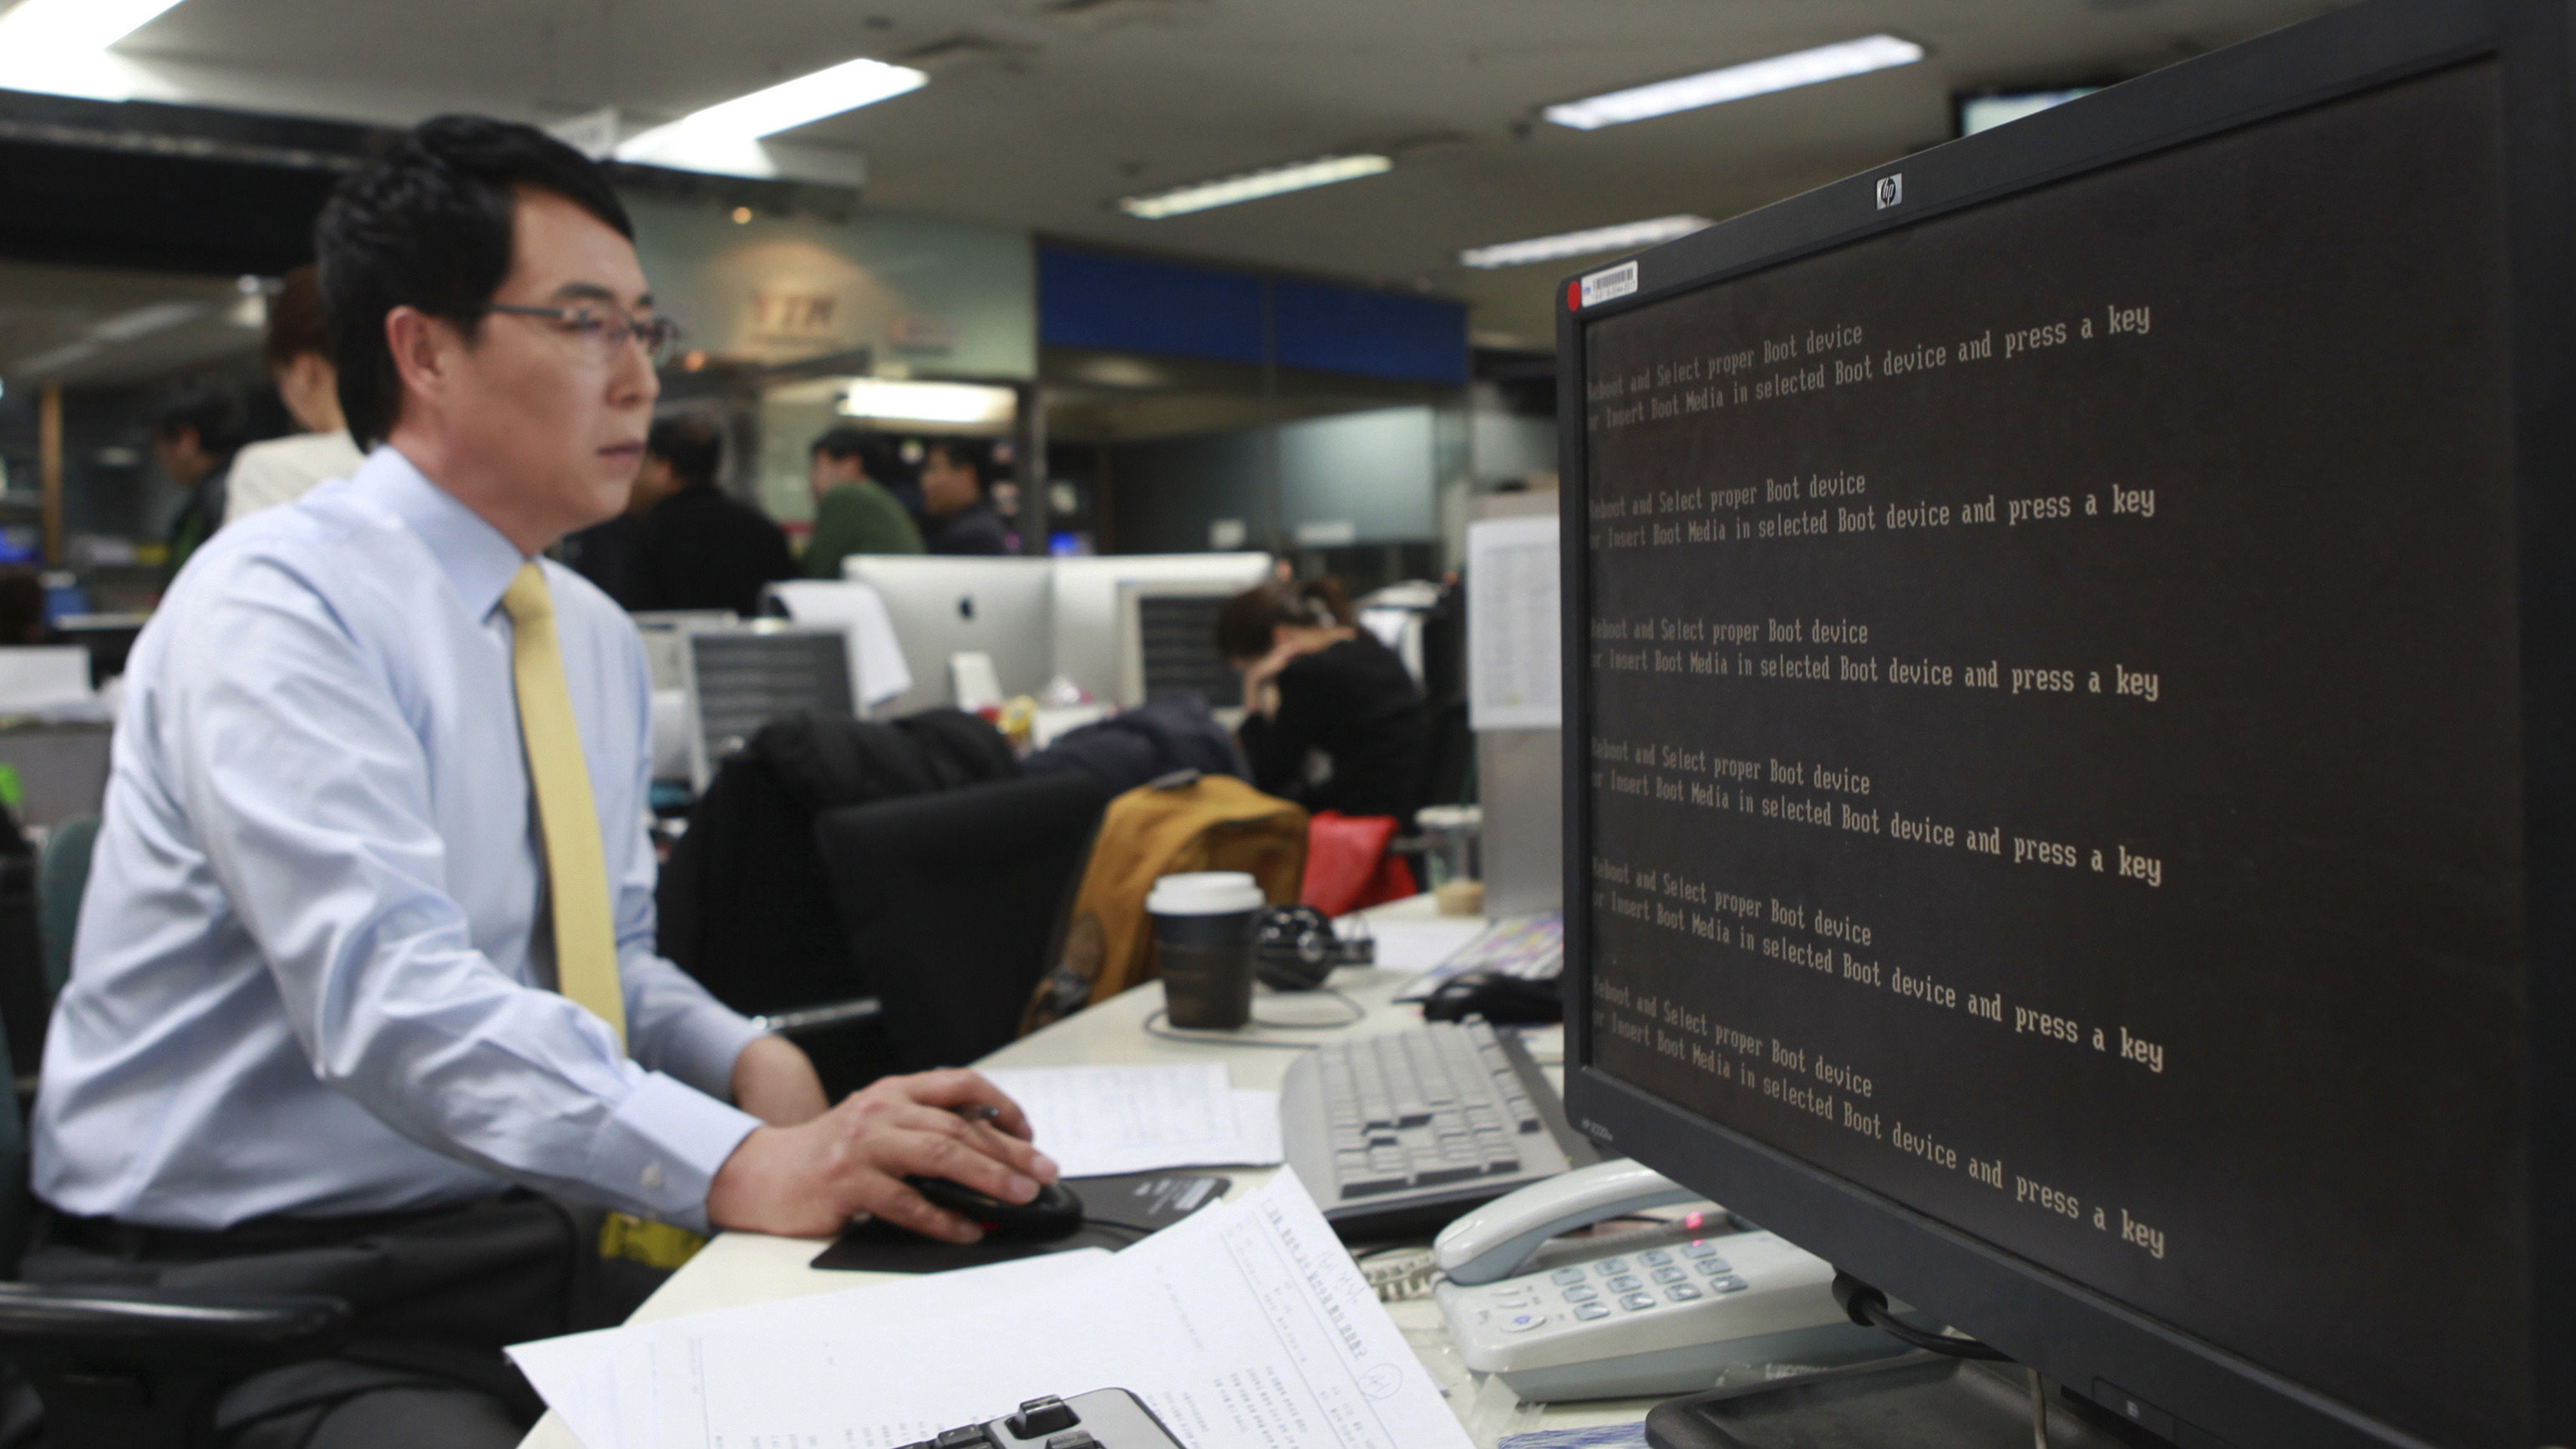 korea hacking photo